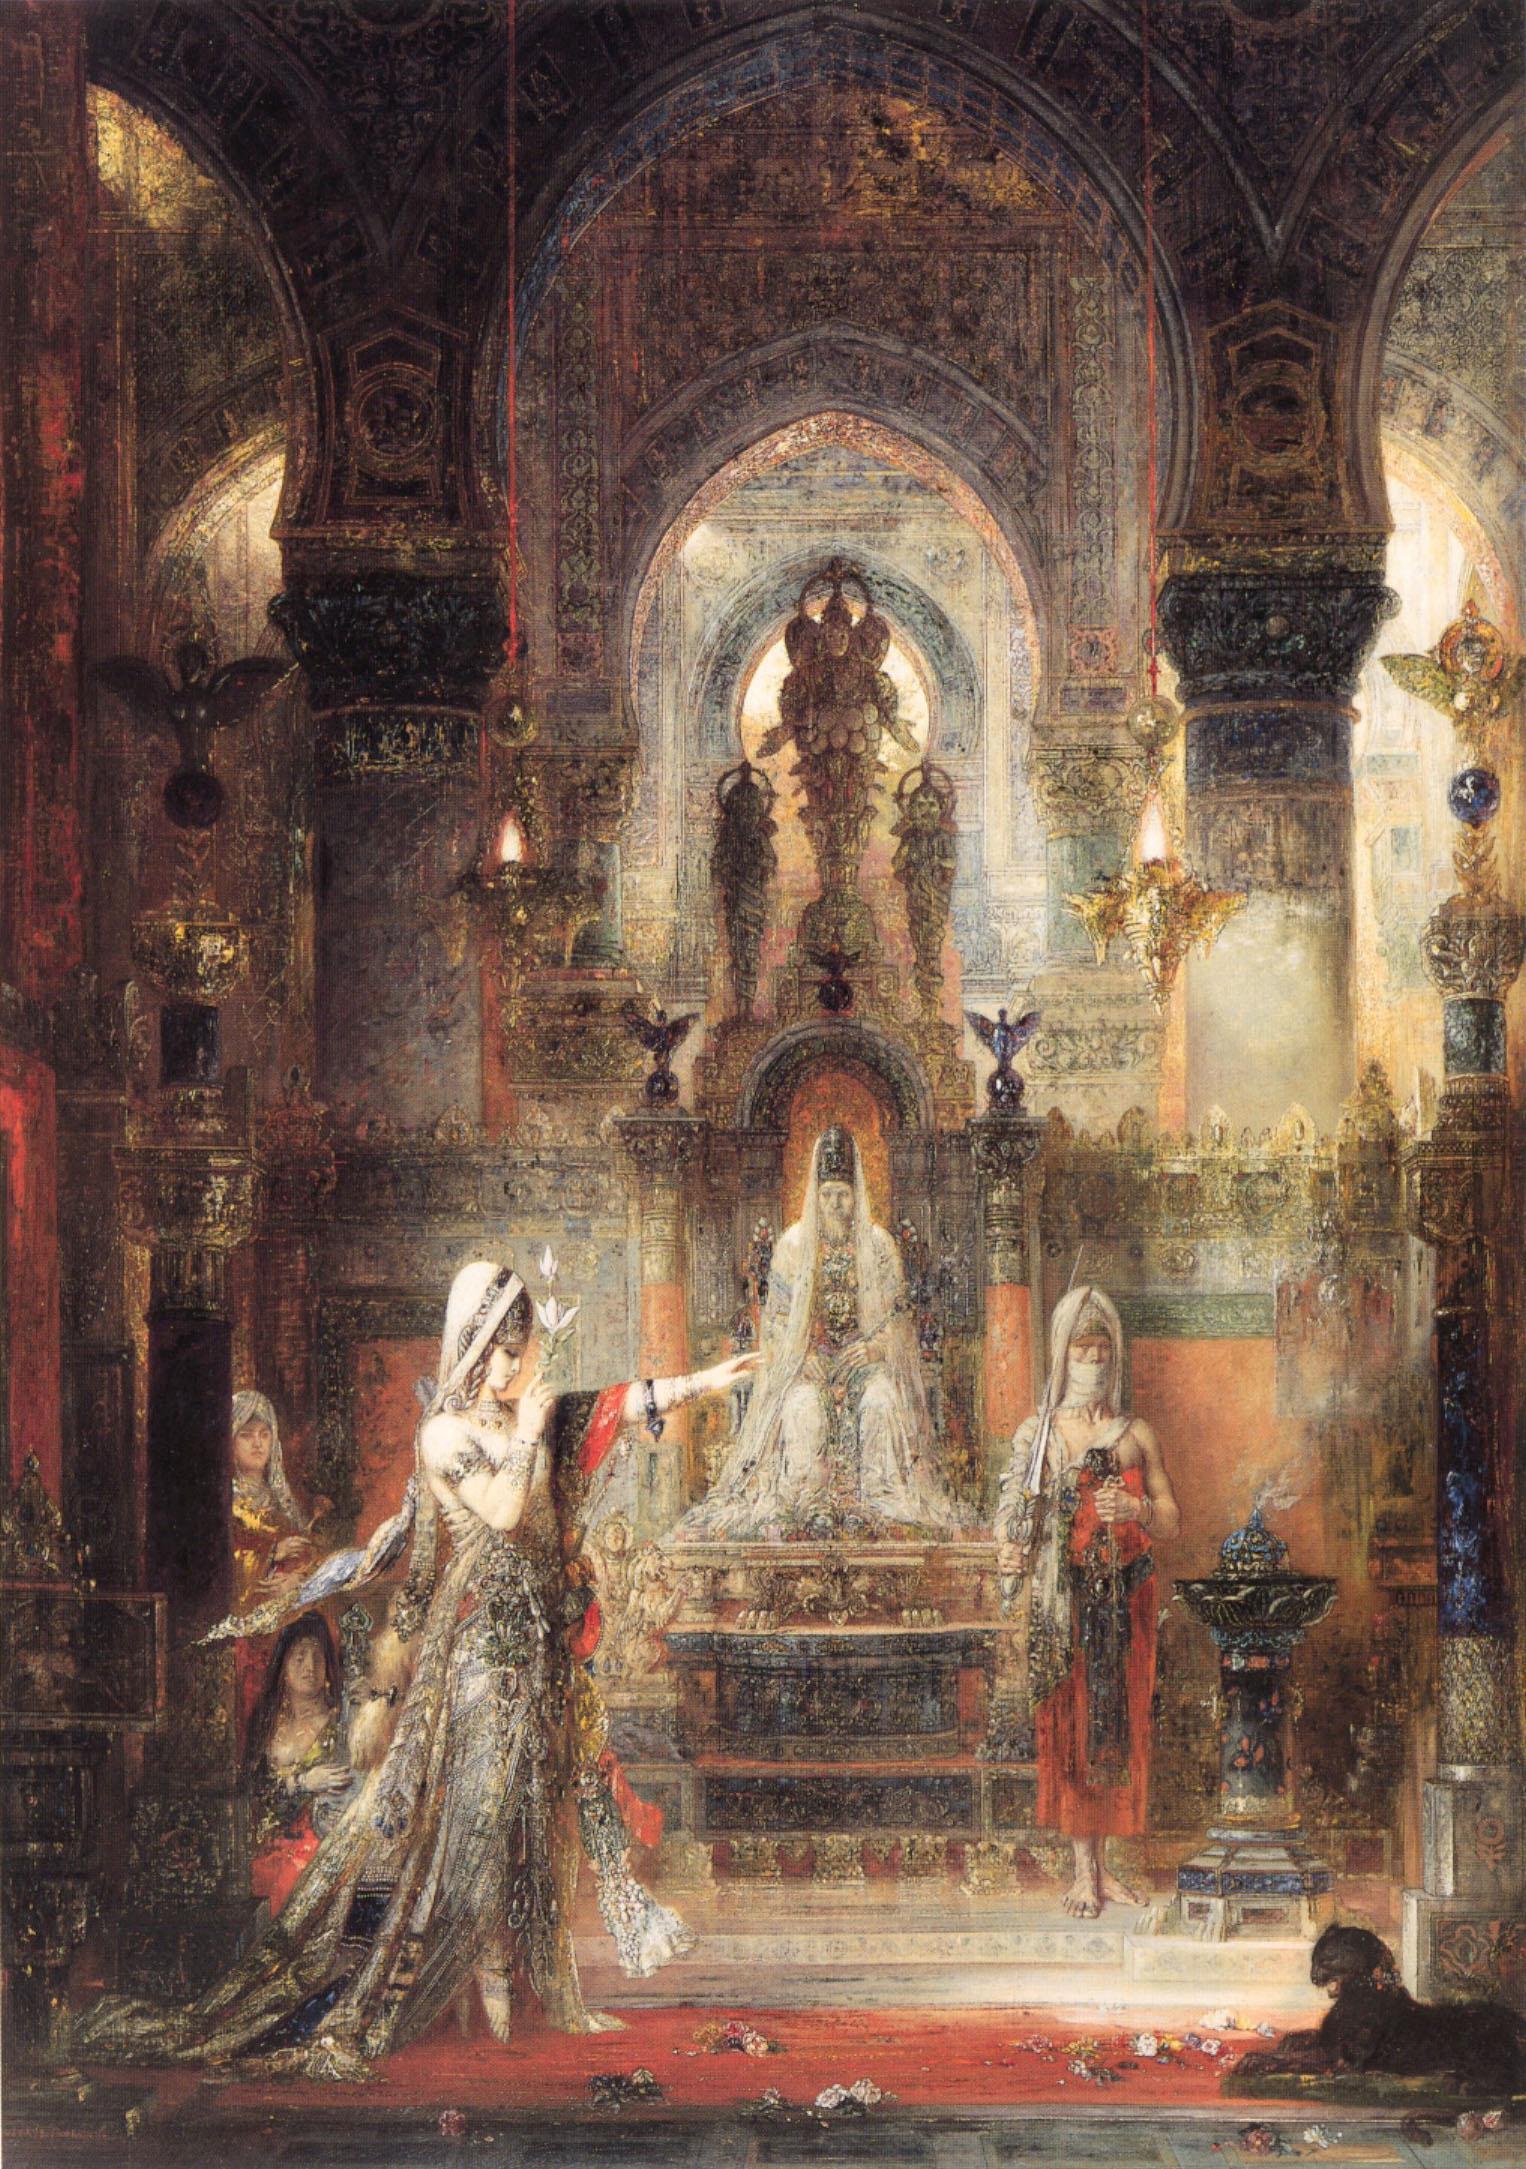 1874-1876_Танец Саломеи перед Иродом (103.5 х 144 см) (Лос-Анжелес, коллекция Эрманда Хаммера)